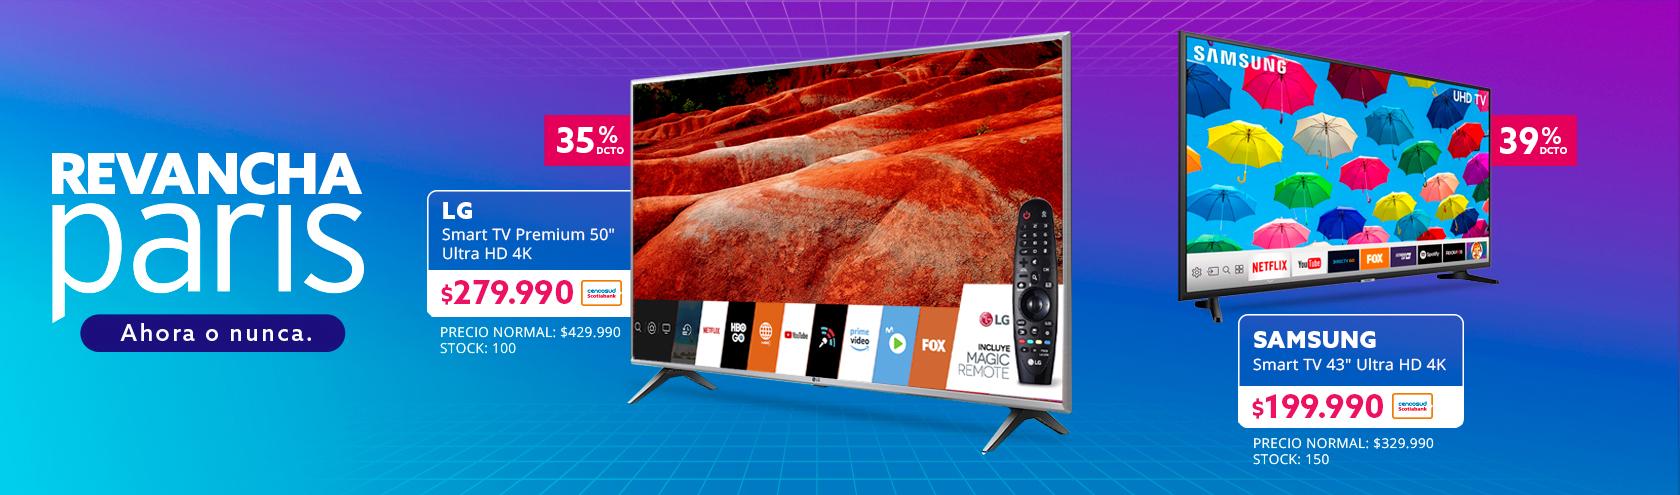 Smart TV Premium 50 pulgadas Ultra HD 4K 50UM7500 a $279.990 con Tarjeta Cencosud